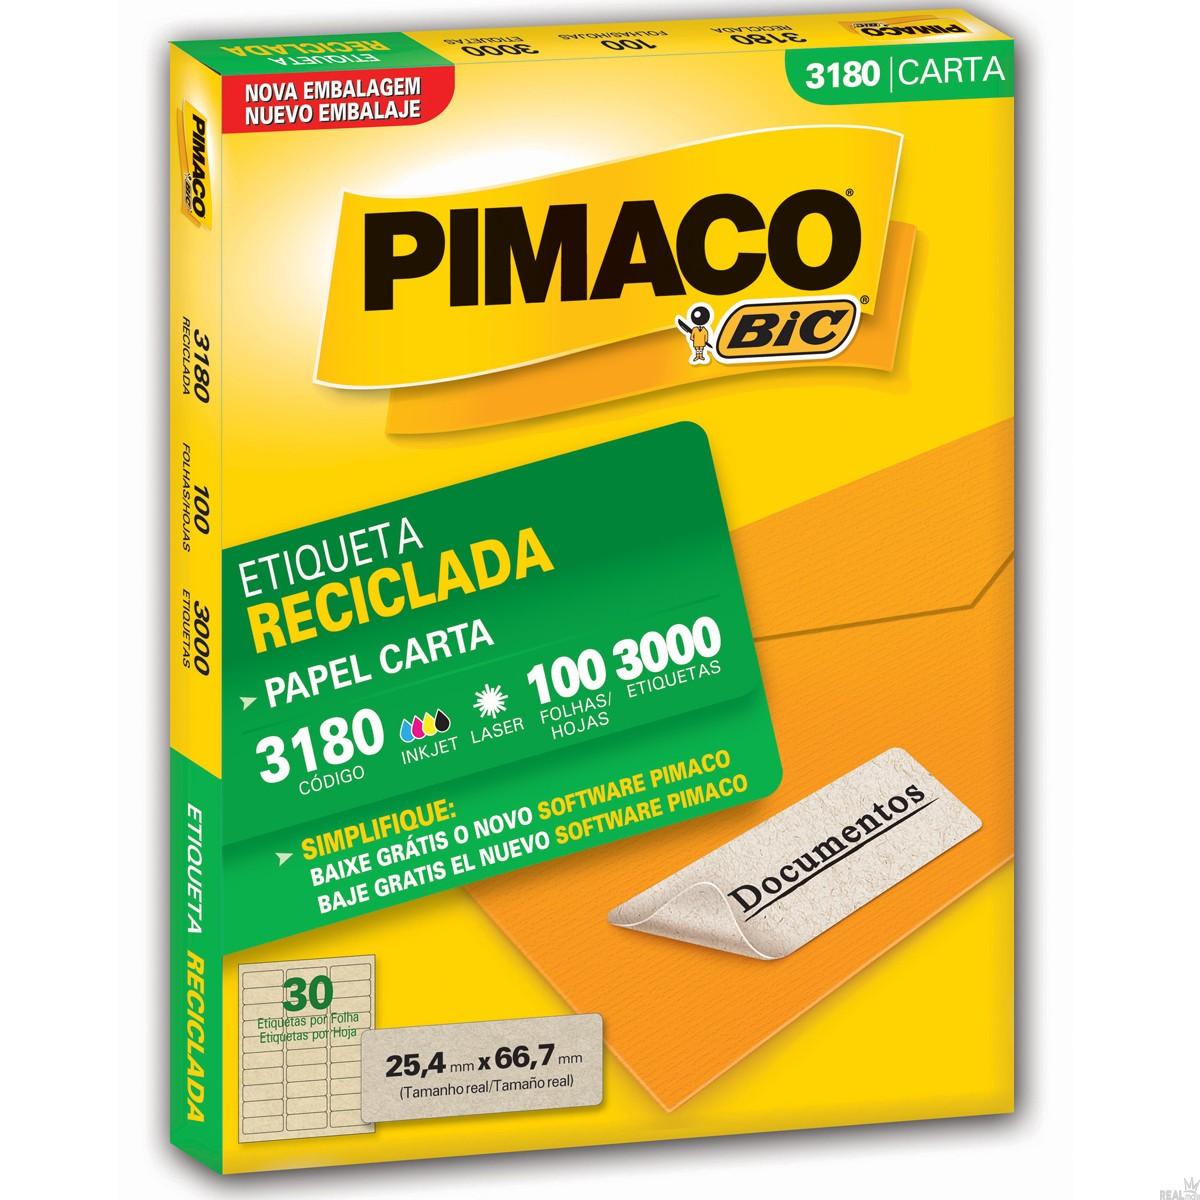 ETIQUETA RECICLADA 3180 25,4X66,7 20 P/FL 3000UN PIMACO